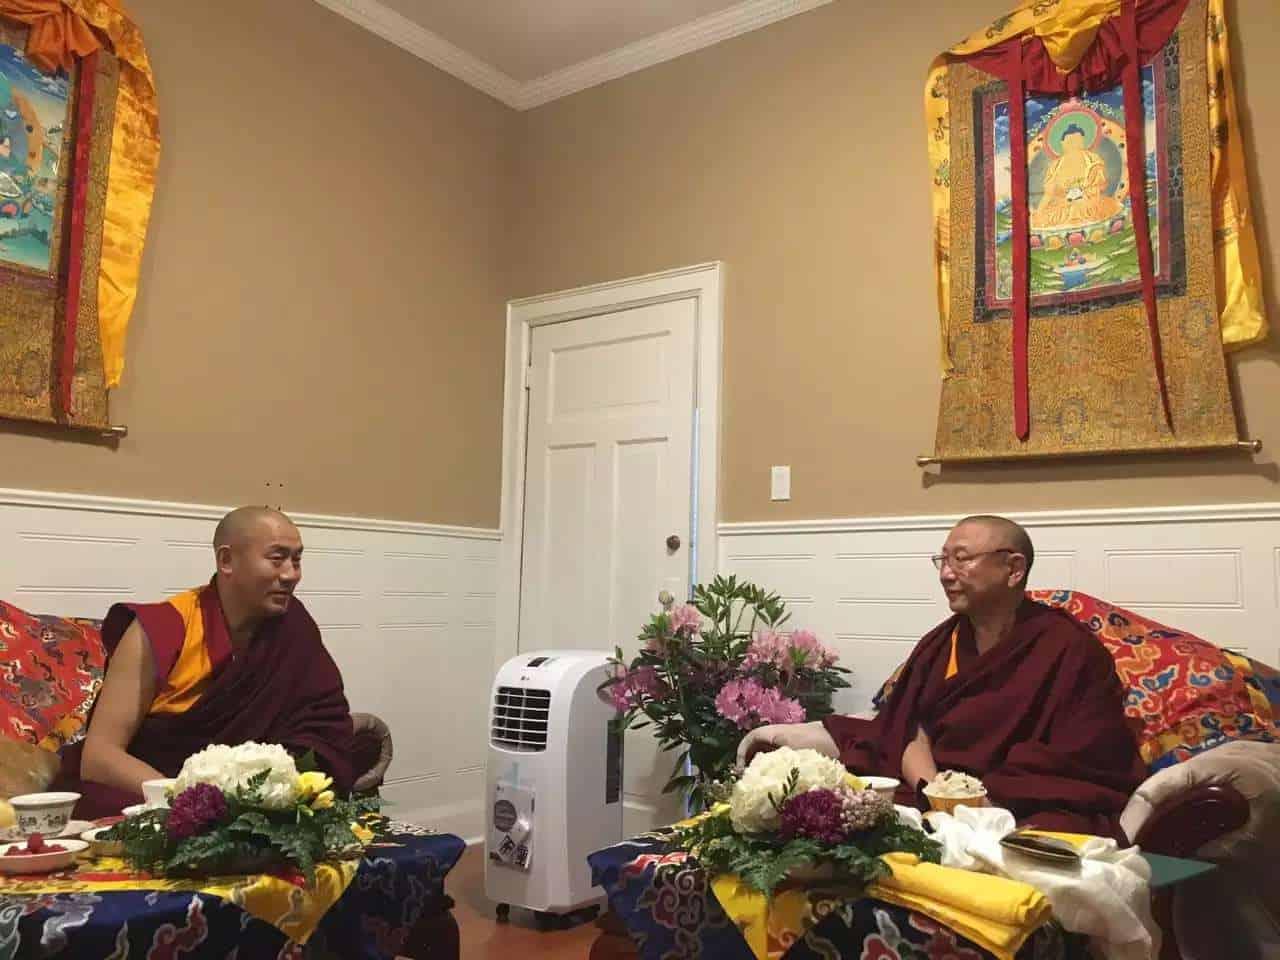 gosok-rinpoche-toronto-2016-18194ee01e427c022aa203fe9d035e6